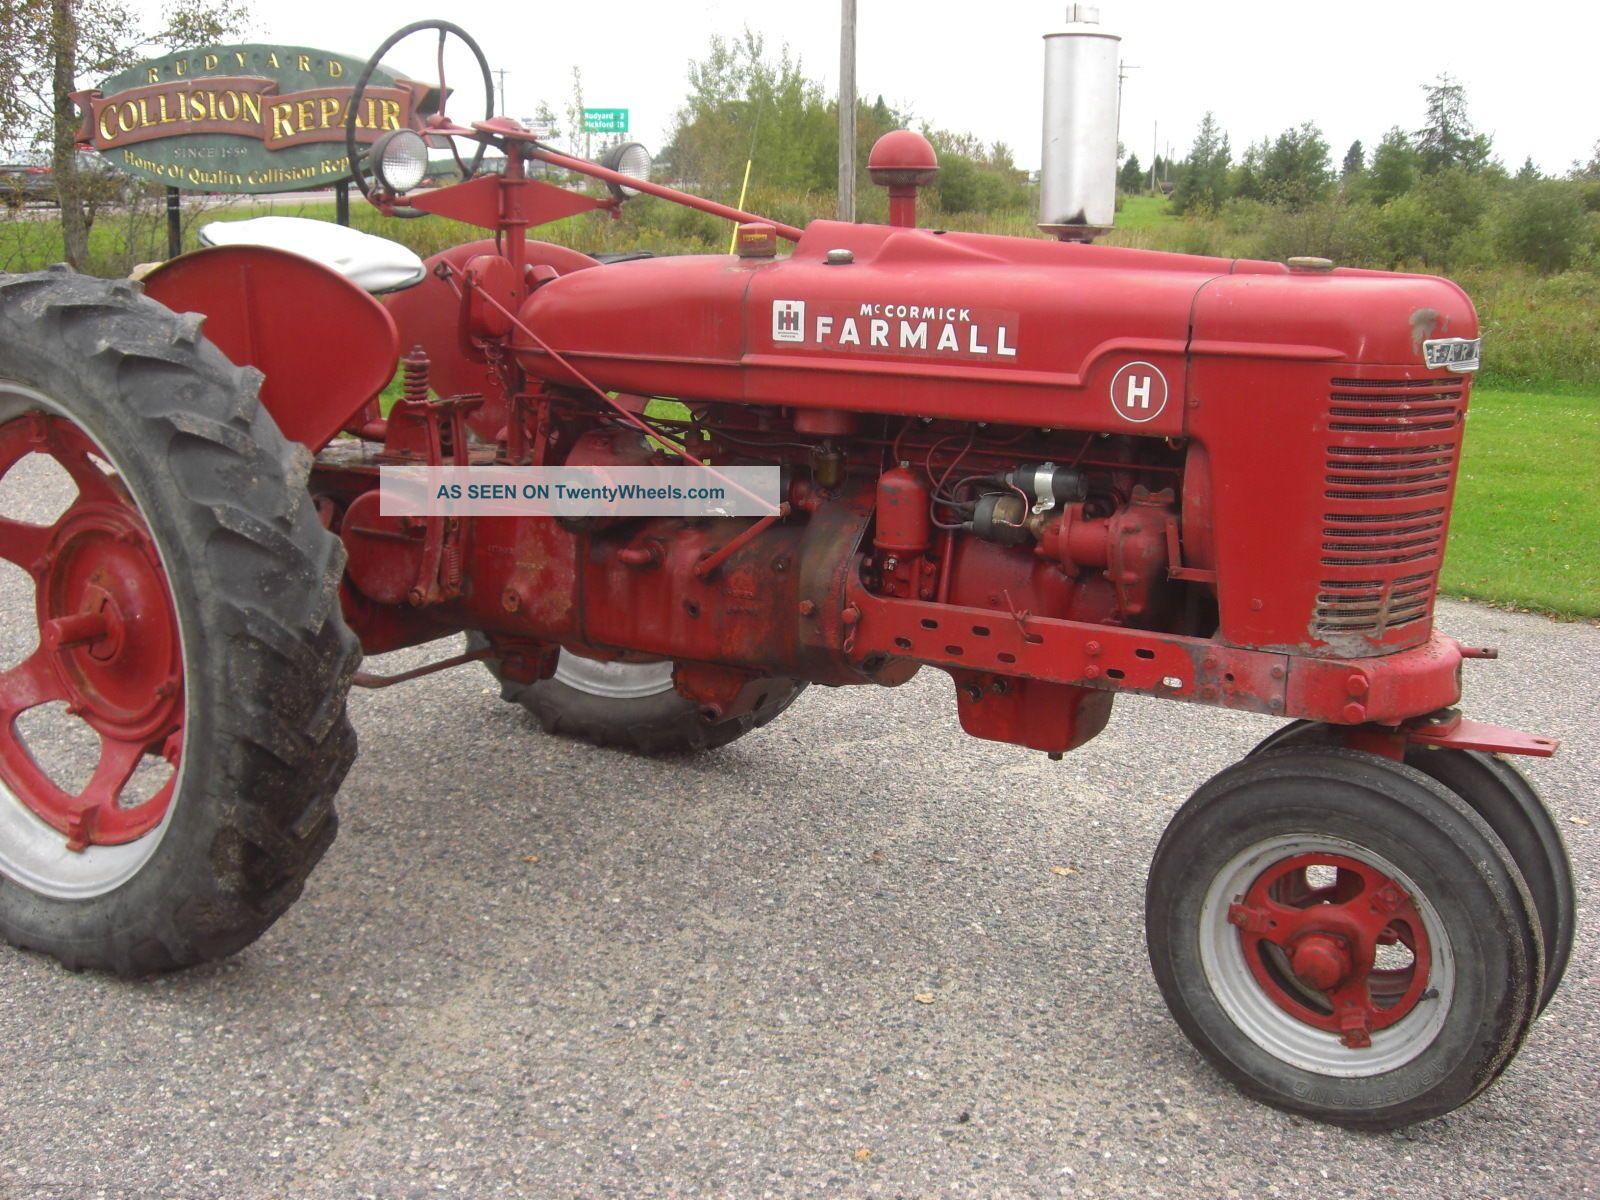 1940 International Harvester Mccormick Farmall H Wheeled